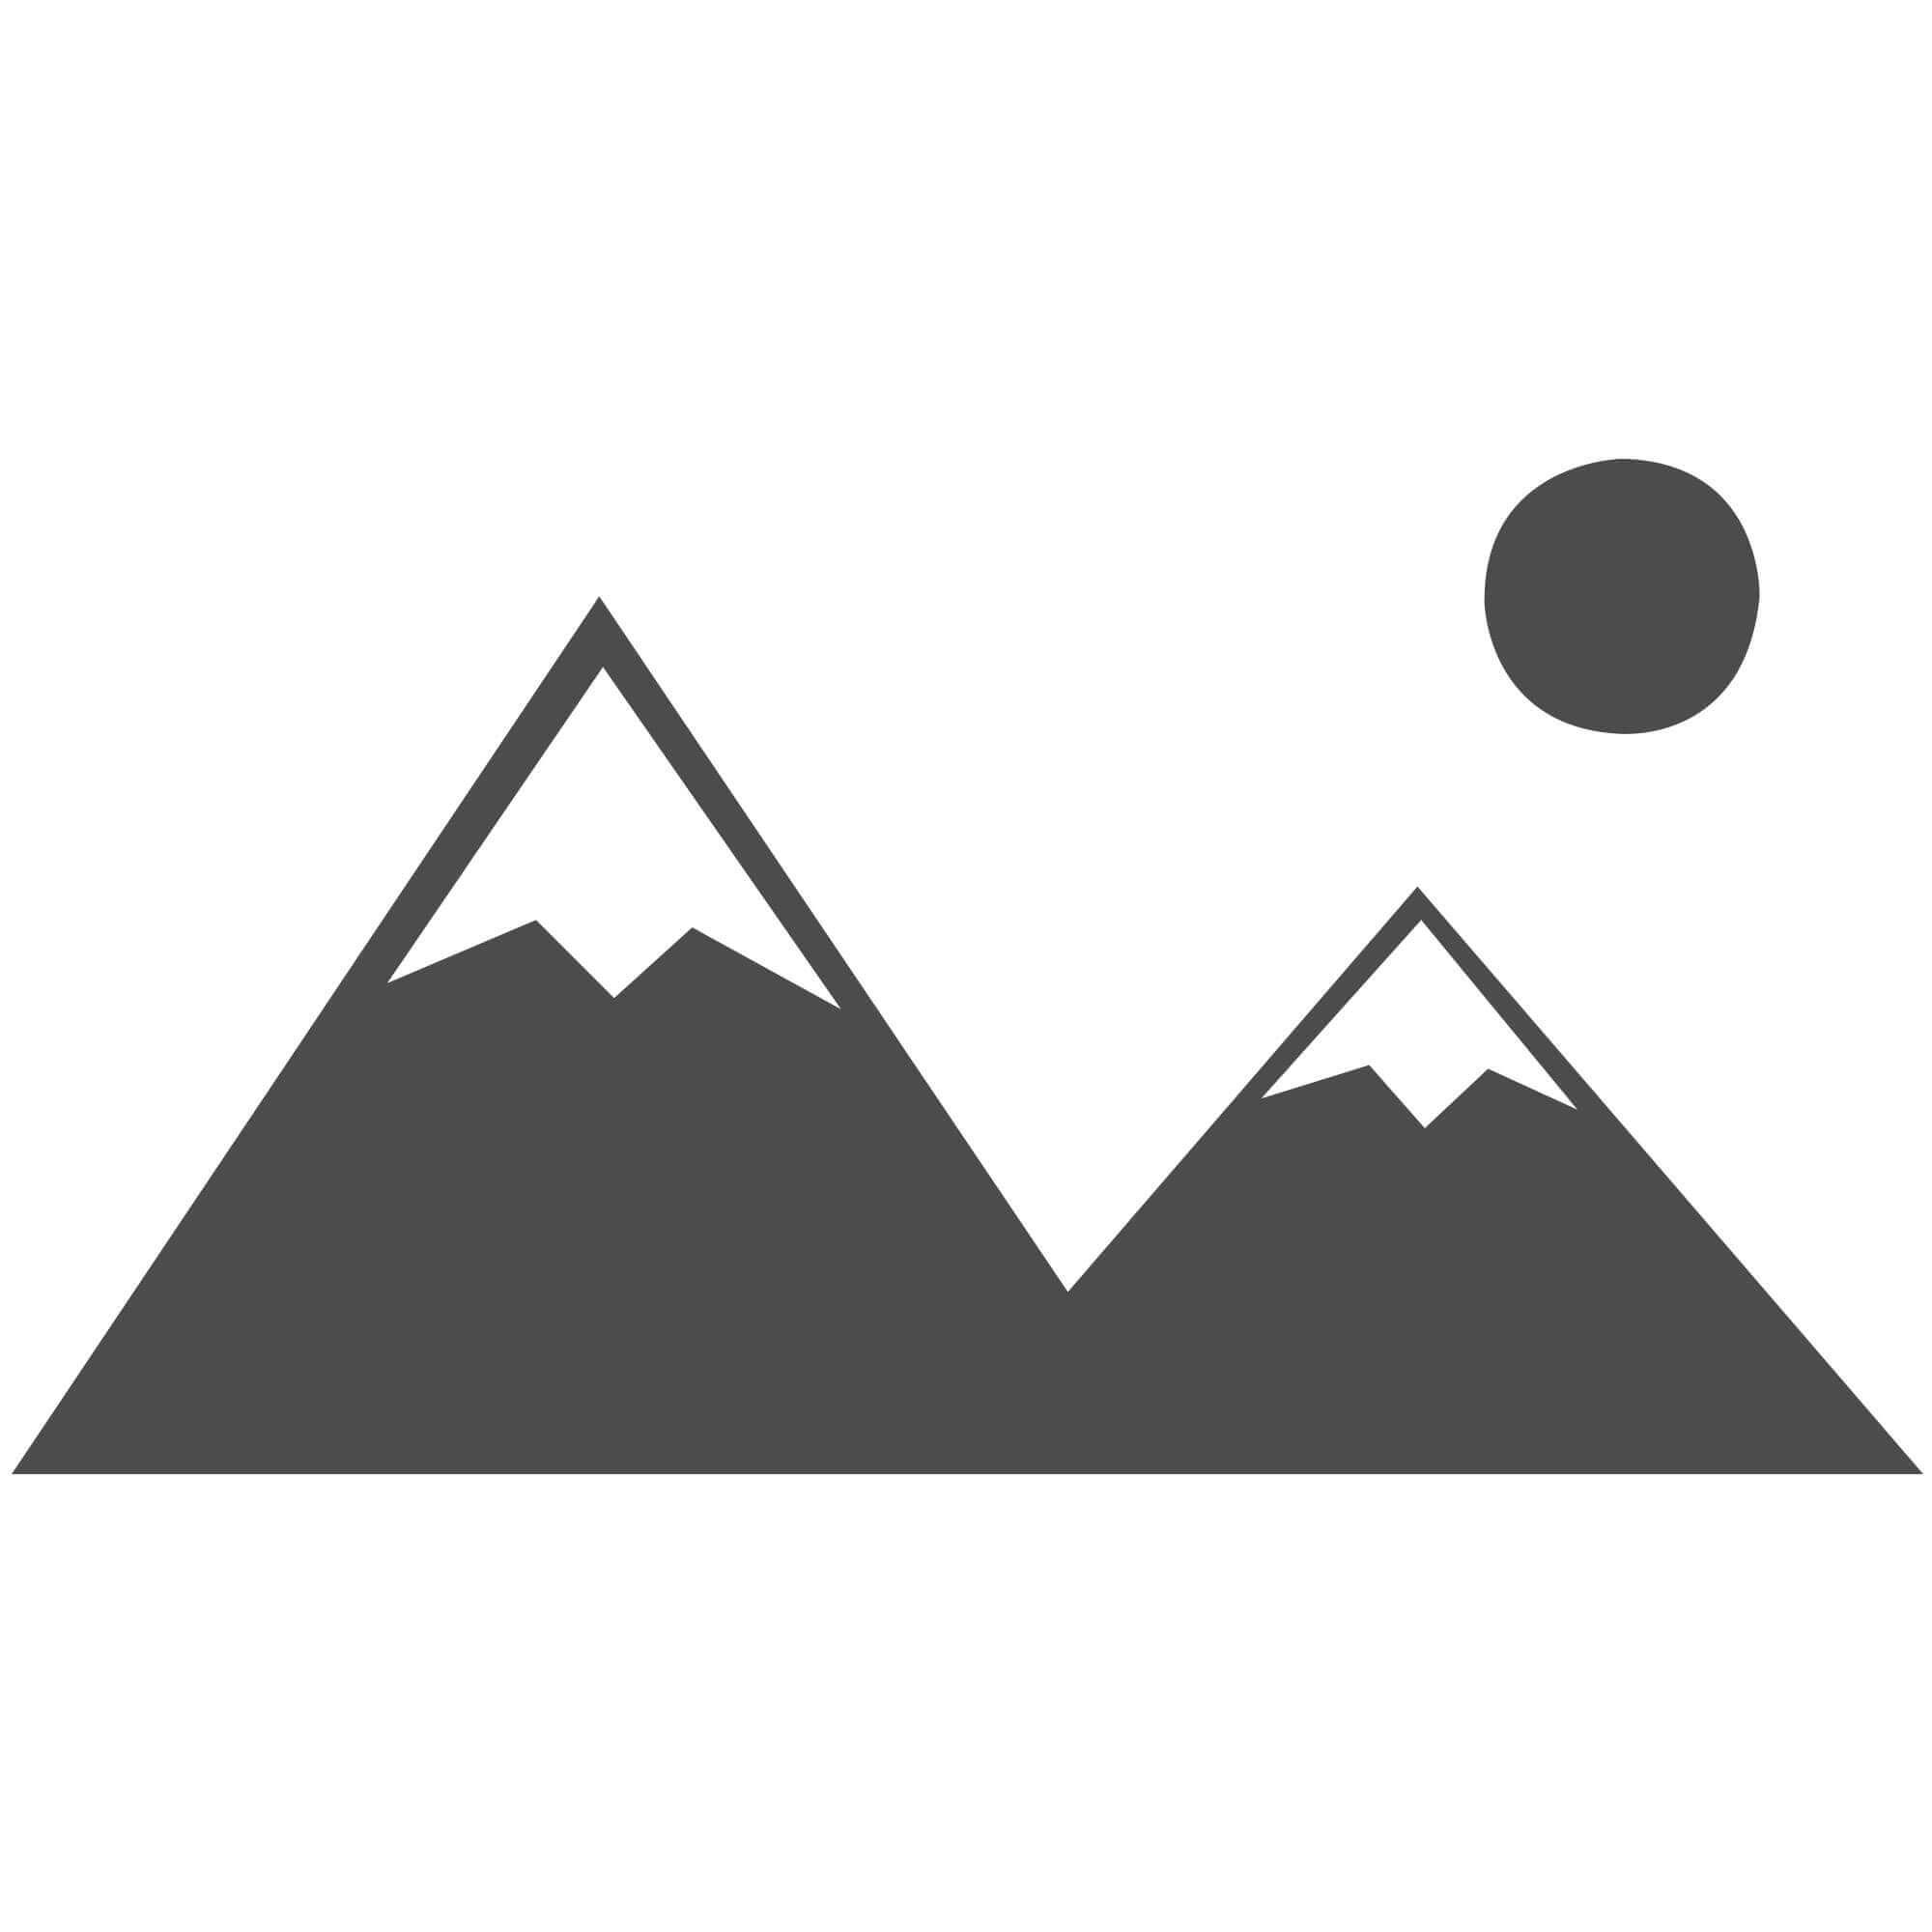 Griot Stripe Rug - Akadinda - KI802 Saffron-122 x 183 cm (4' x 6')